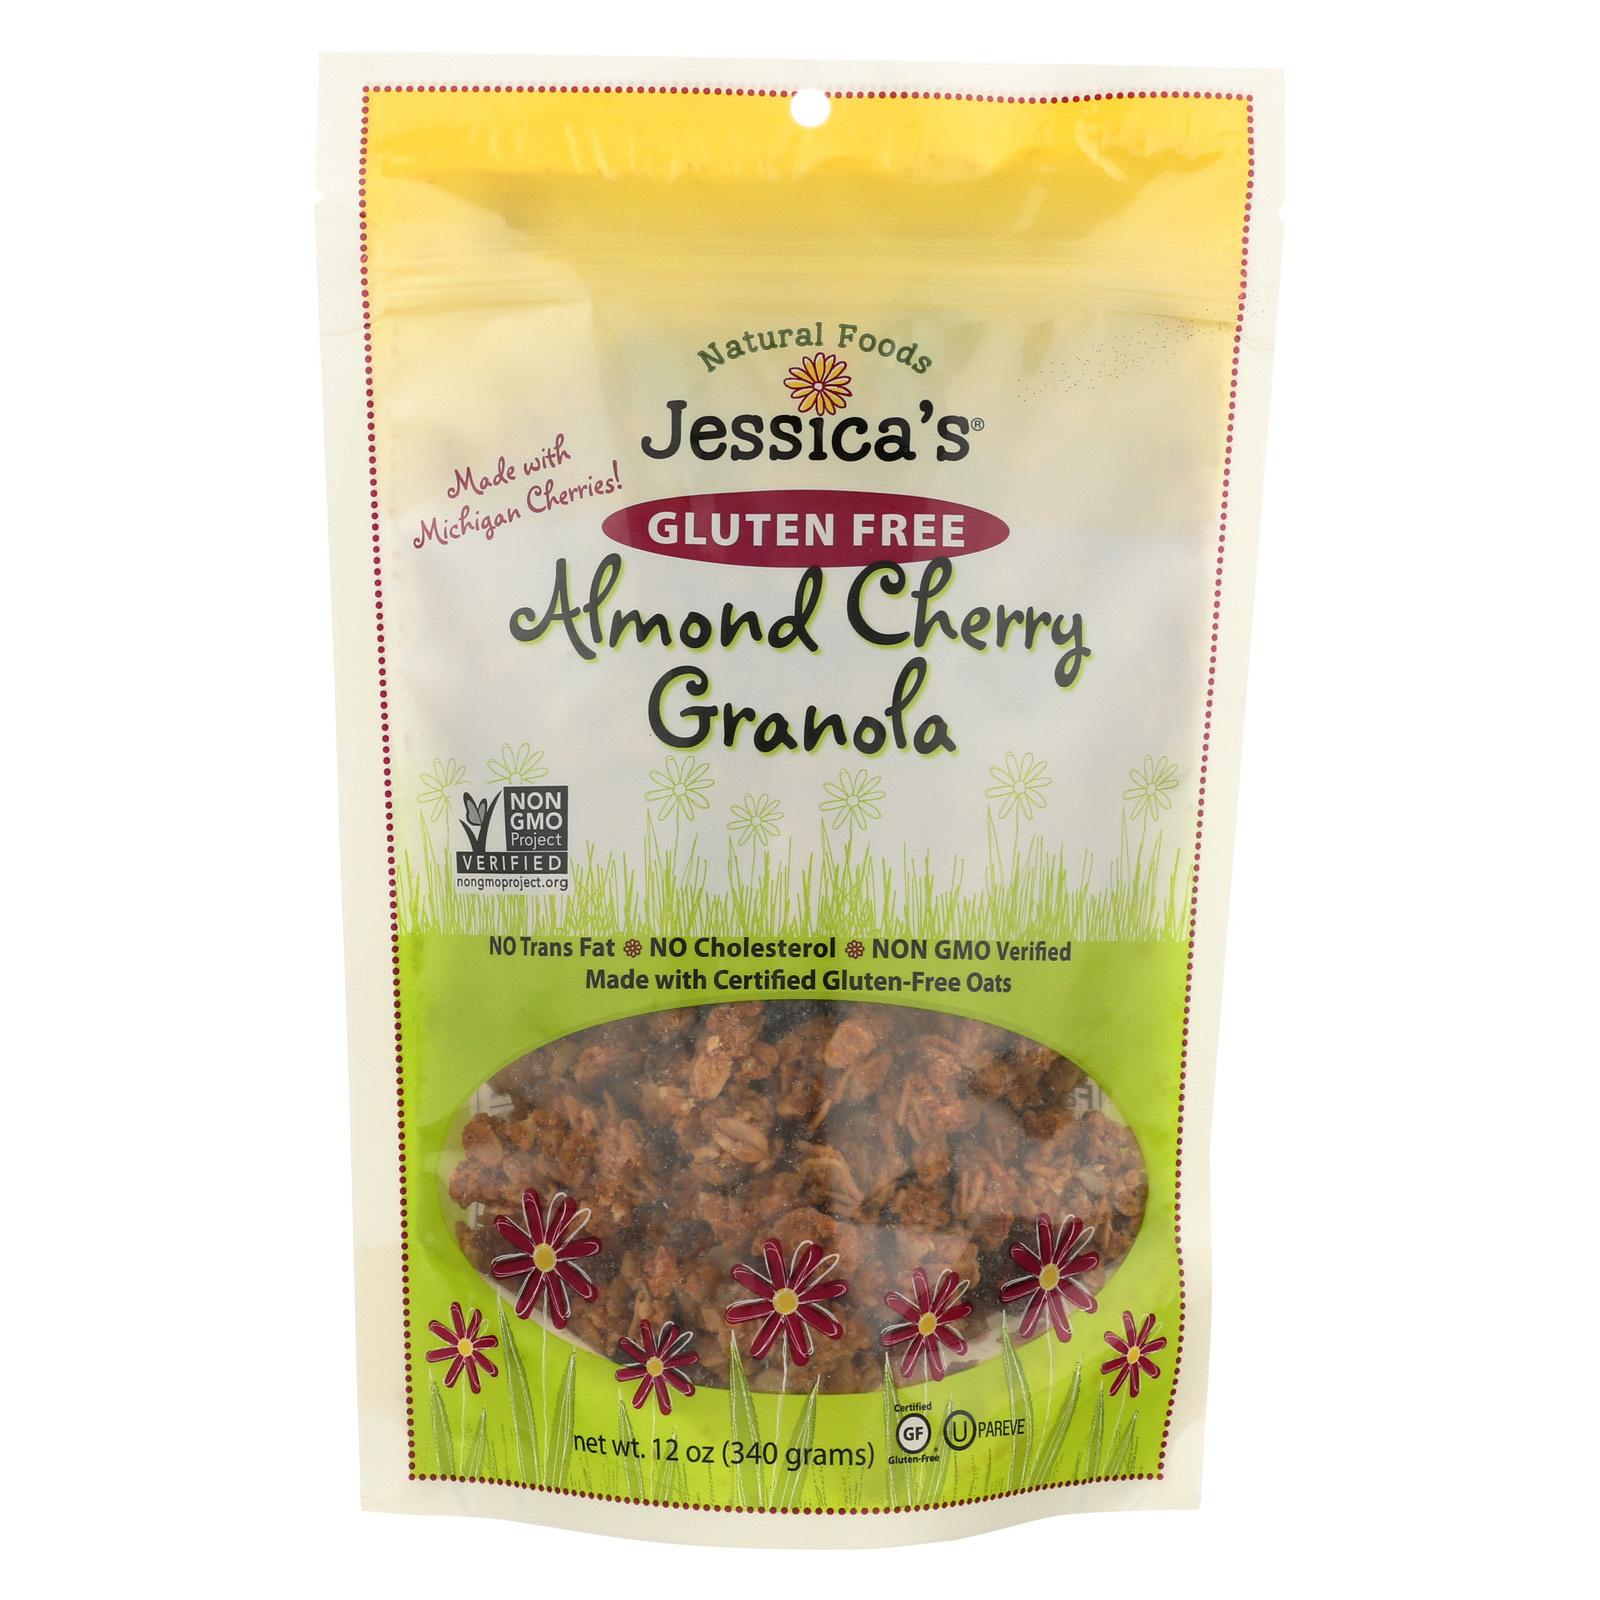 Jessica's Natural Foods Granola - Almond Cherry - Case of 12 - 12 oz.